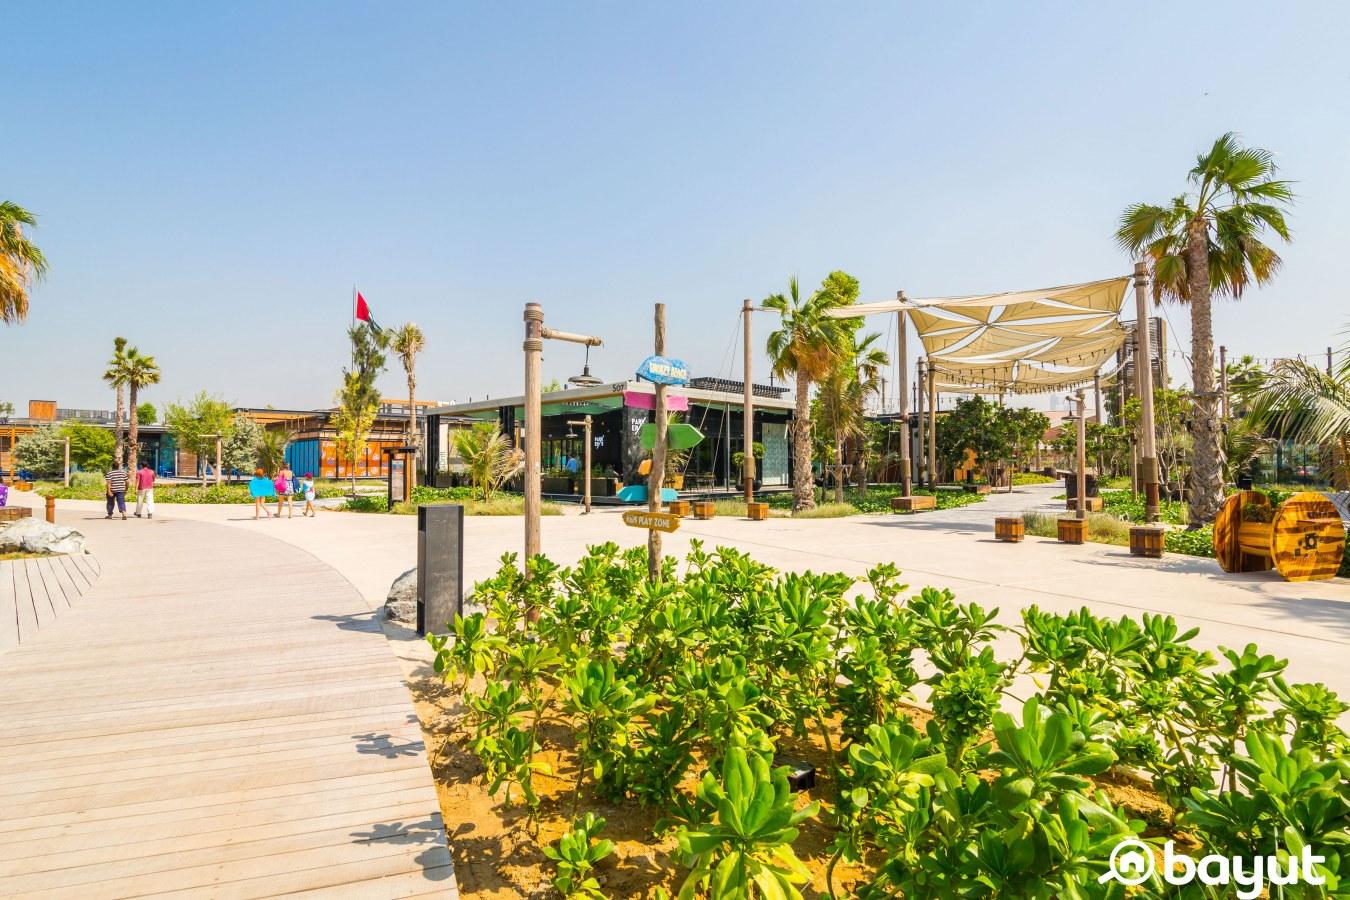 Landscaping at La Mer Dubai